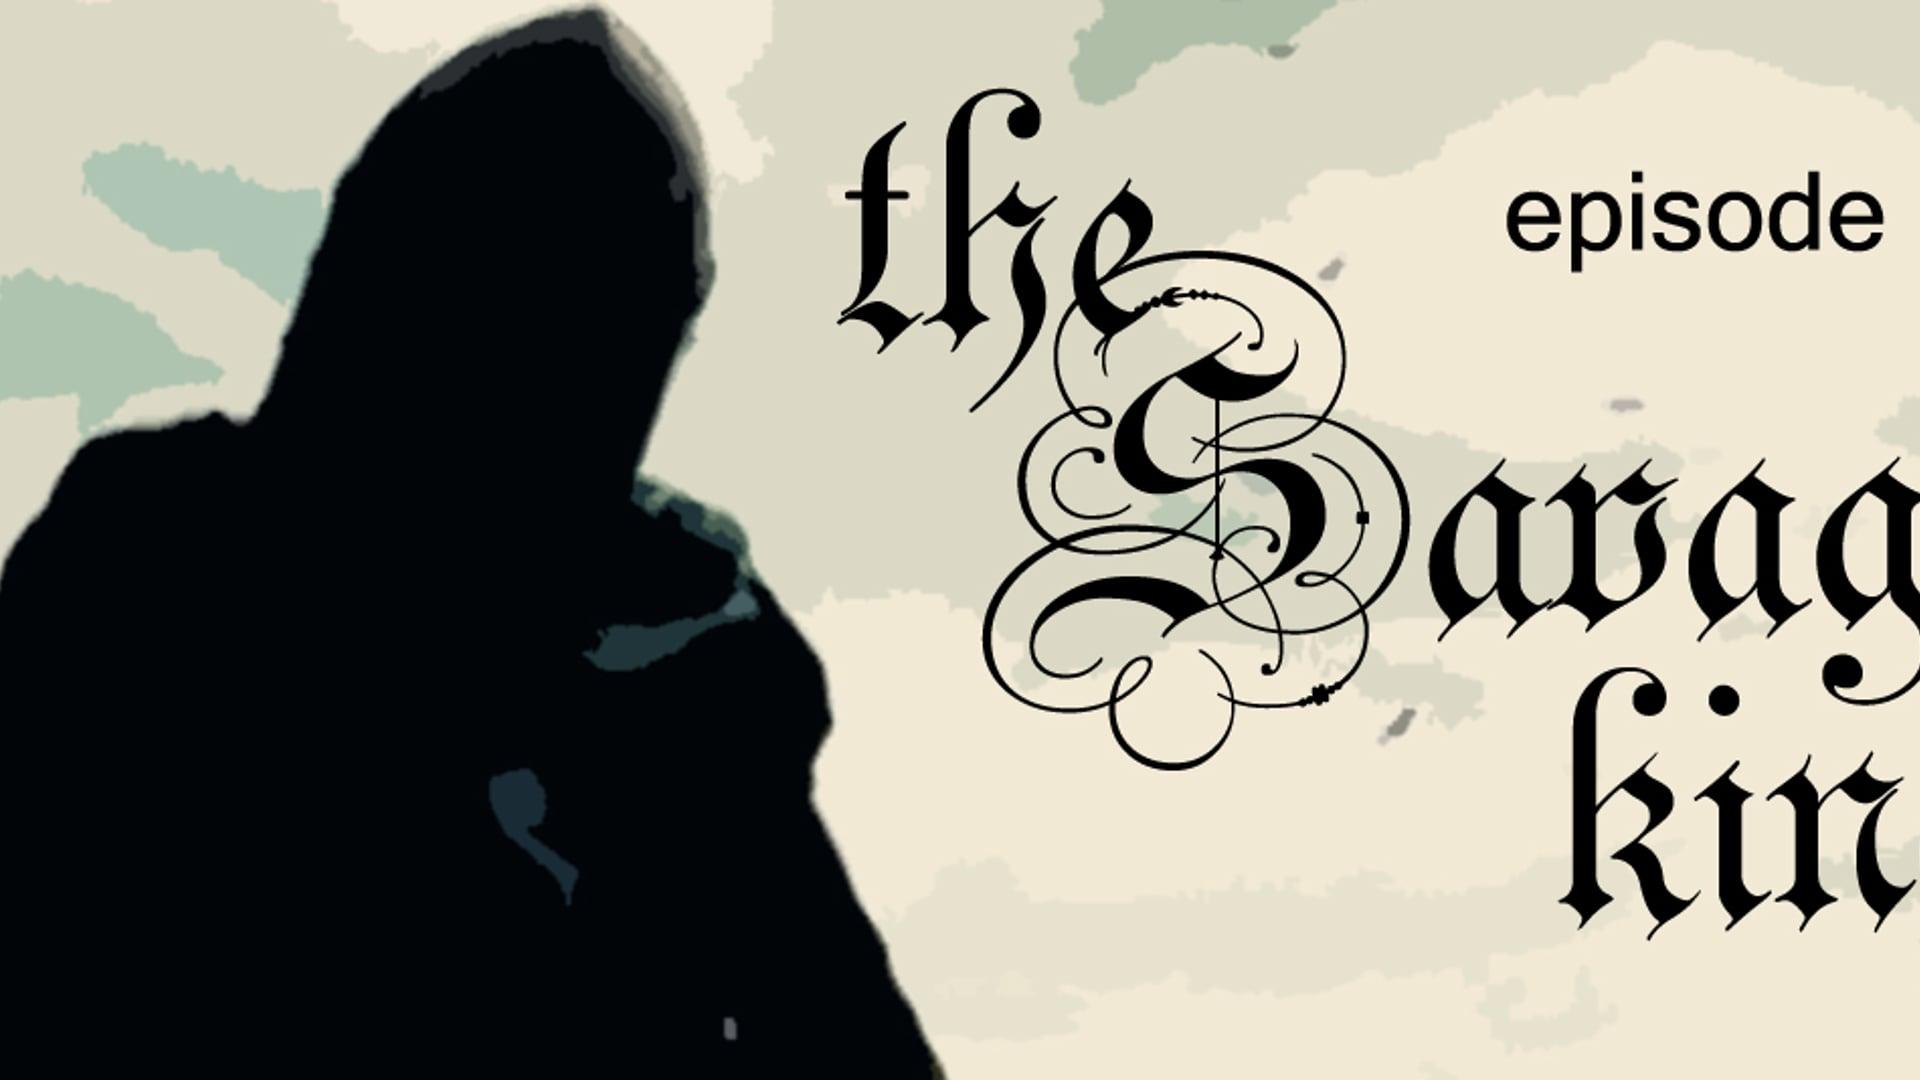 E12: The Savage King